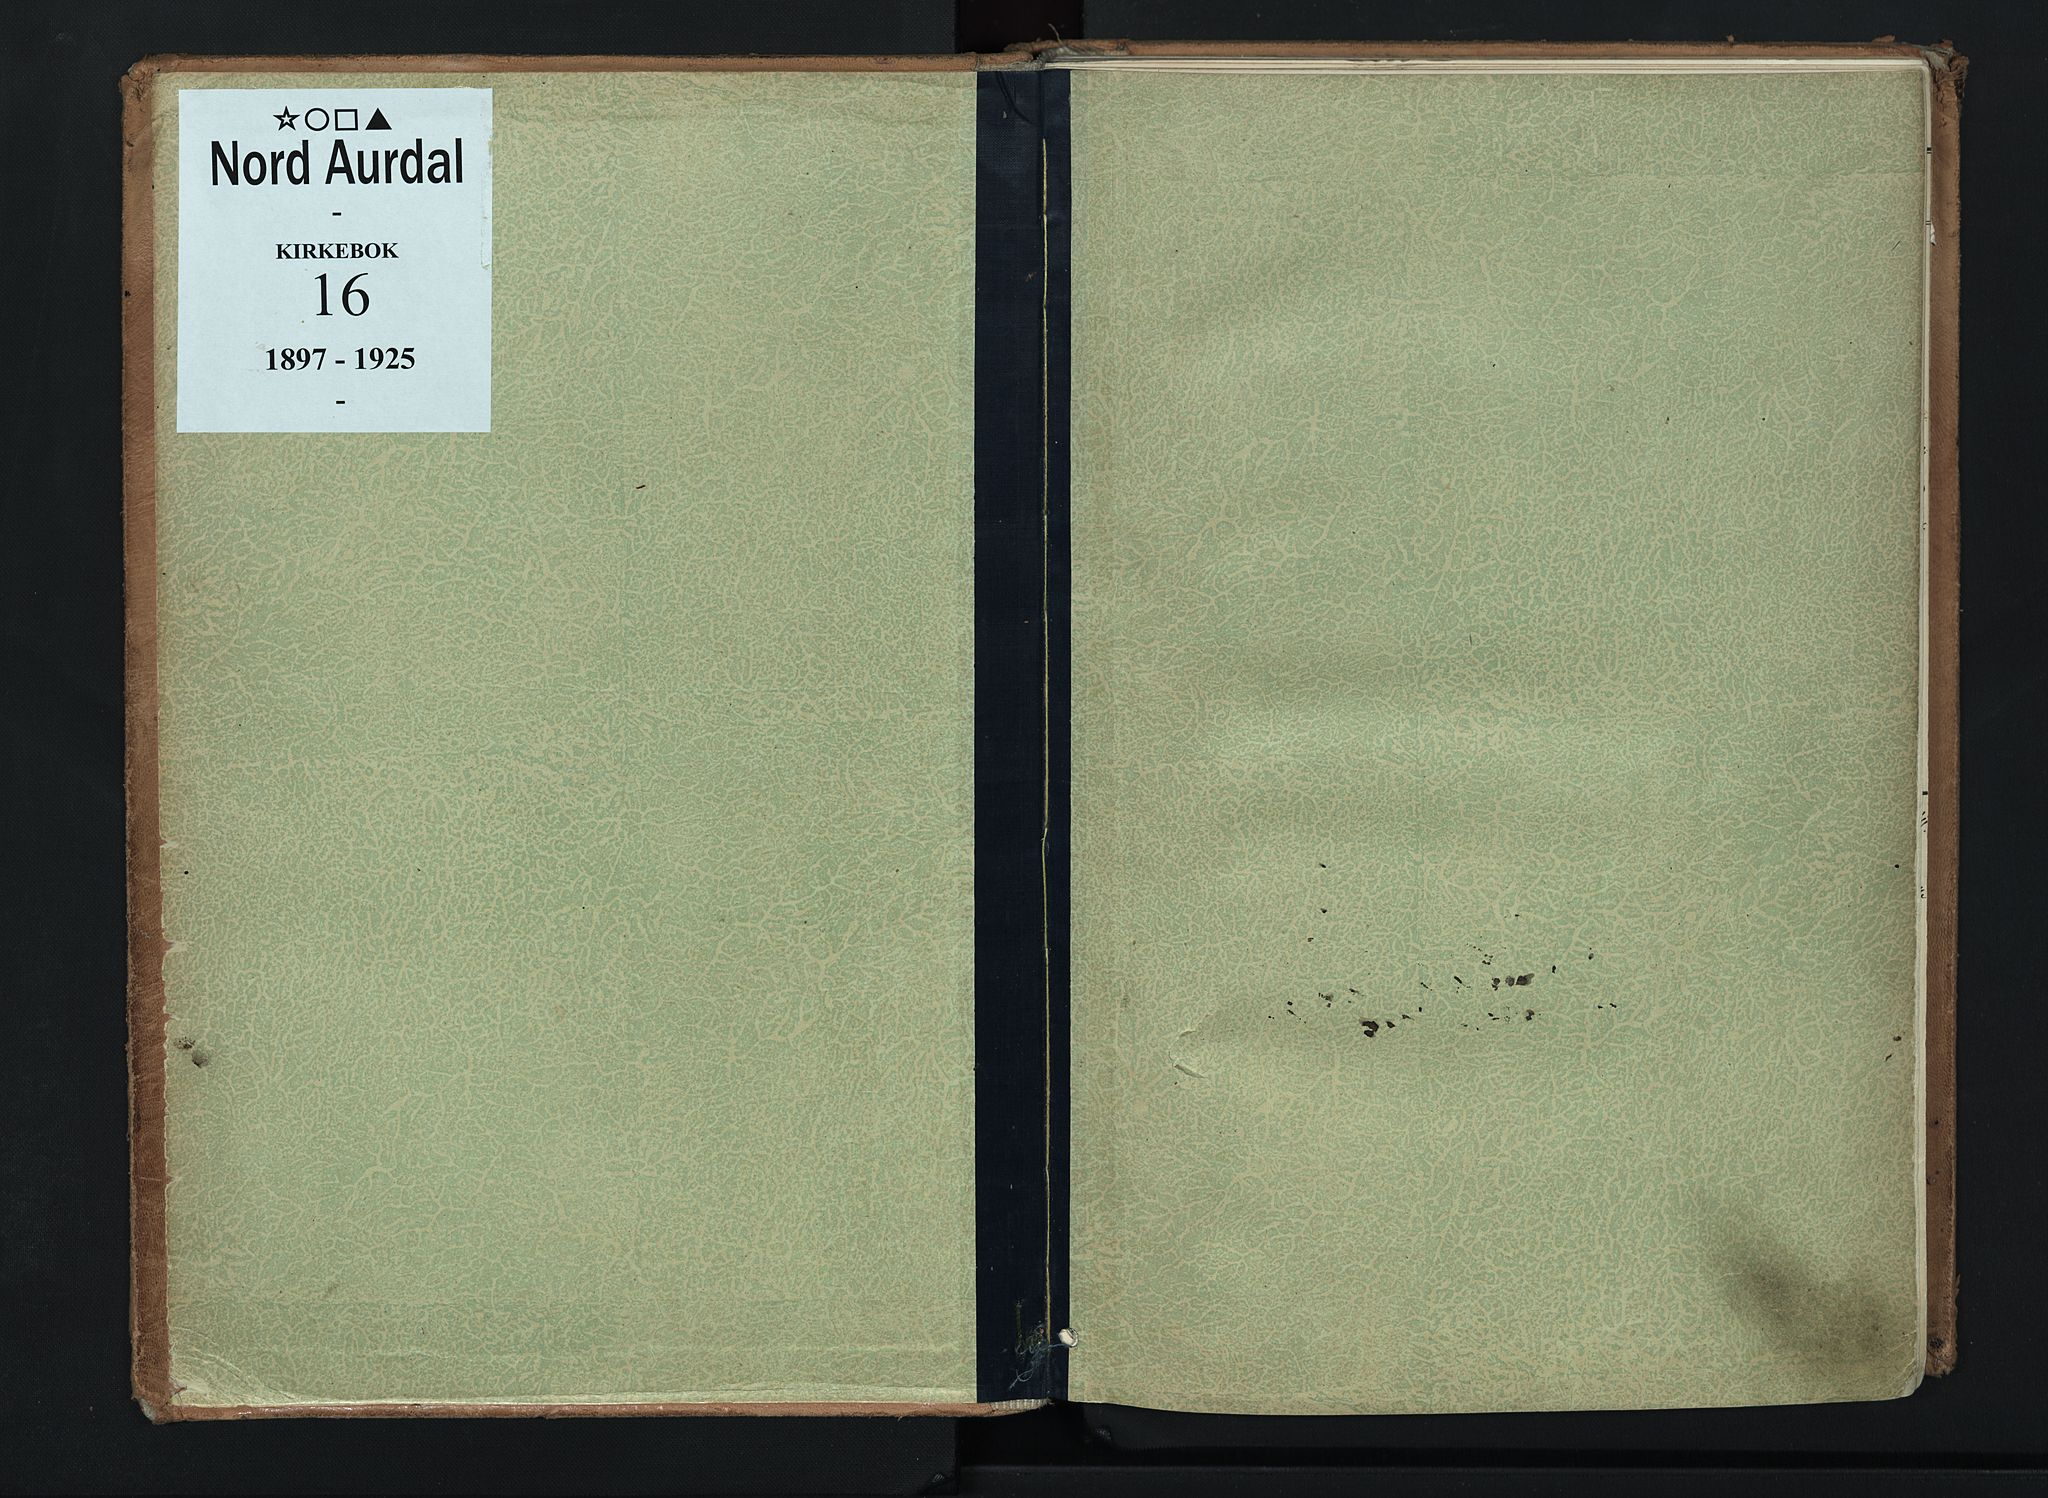 SAH, Nord-Aurdal prestekontor, Ministerialbok nr. 16, 1897-1925